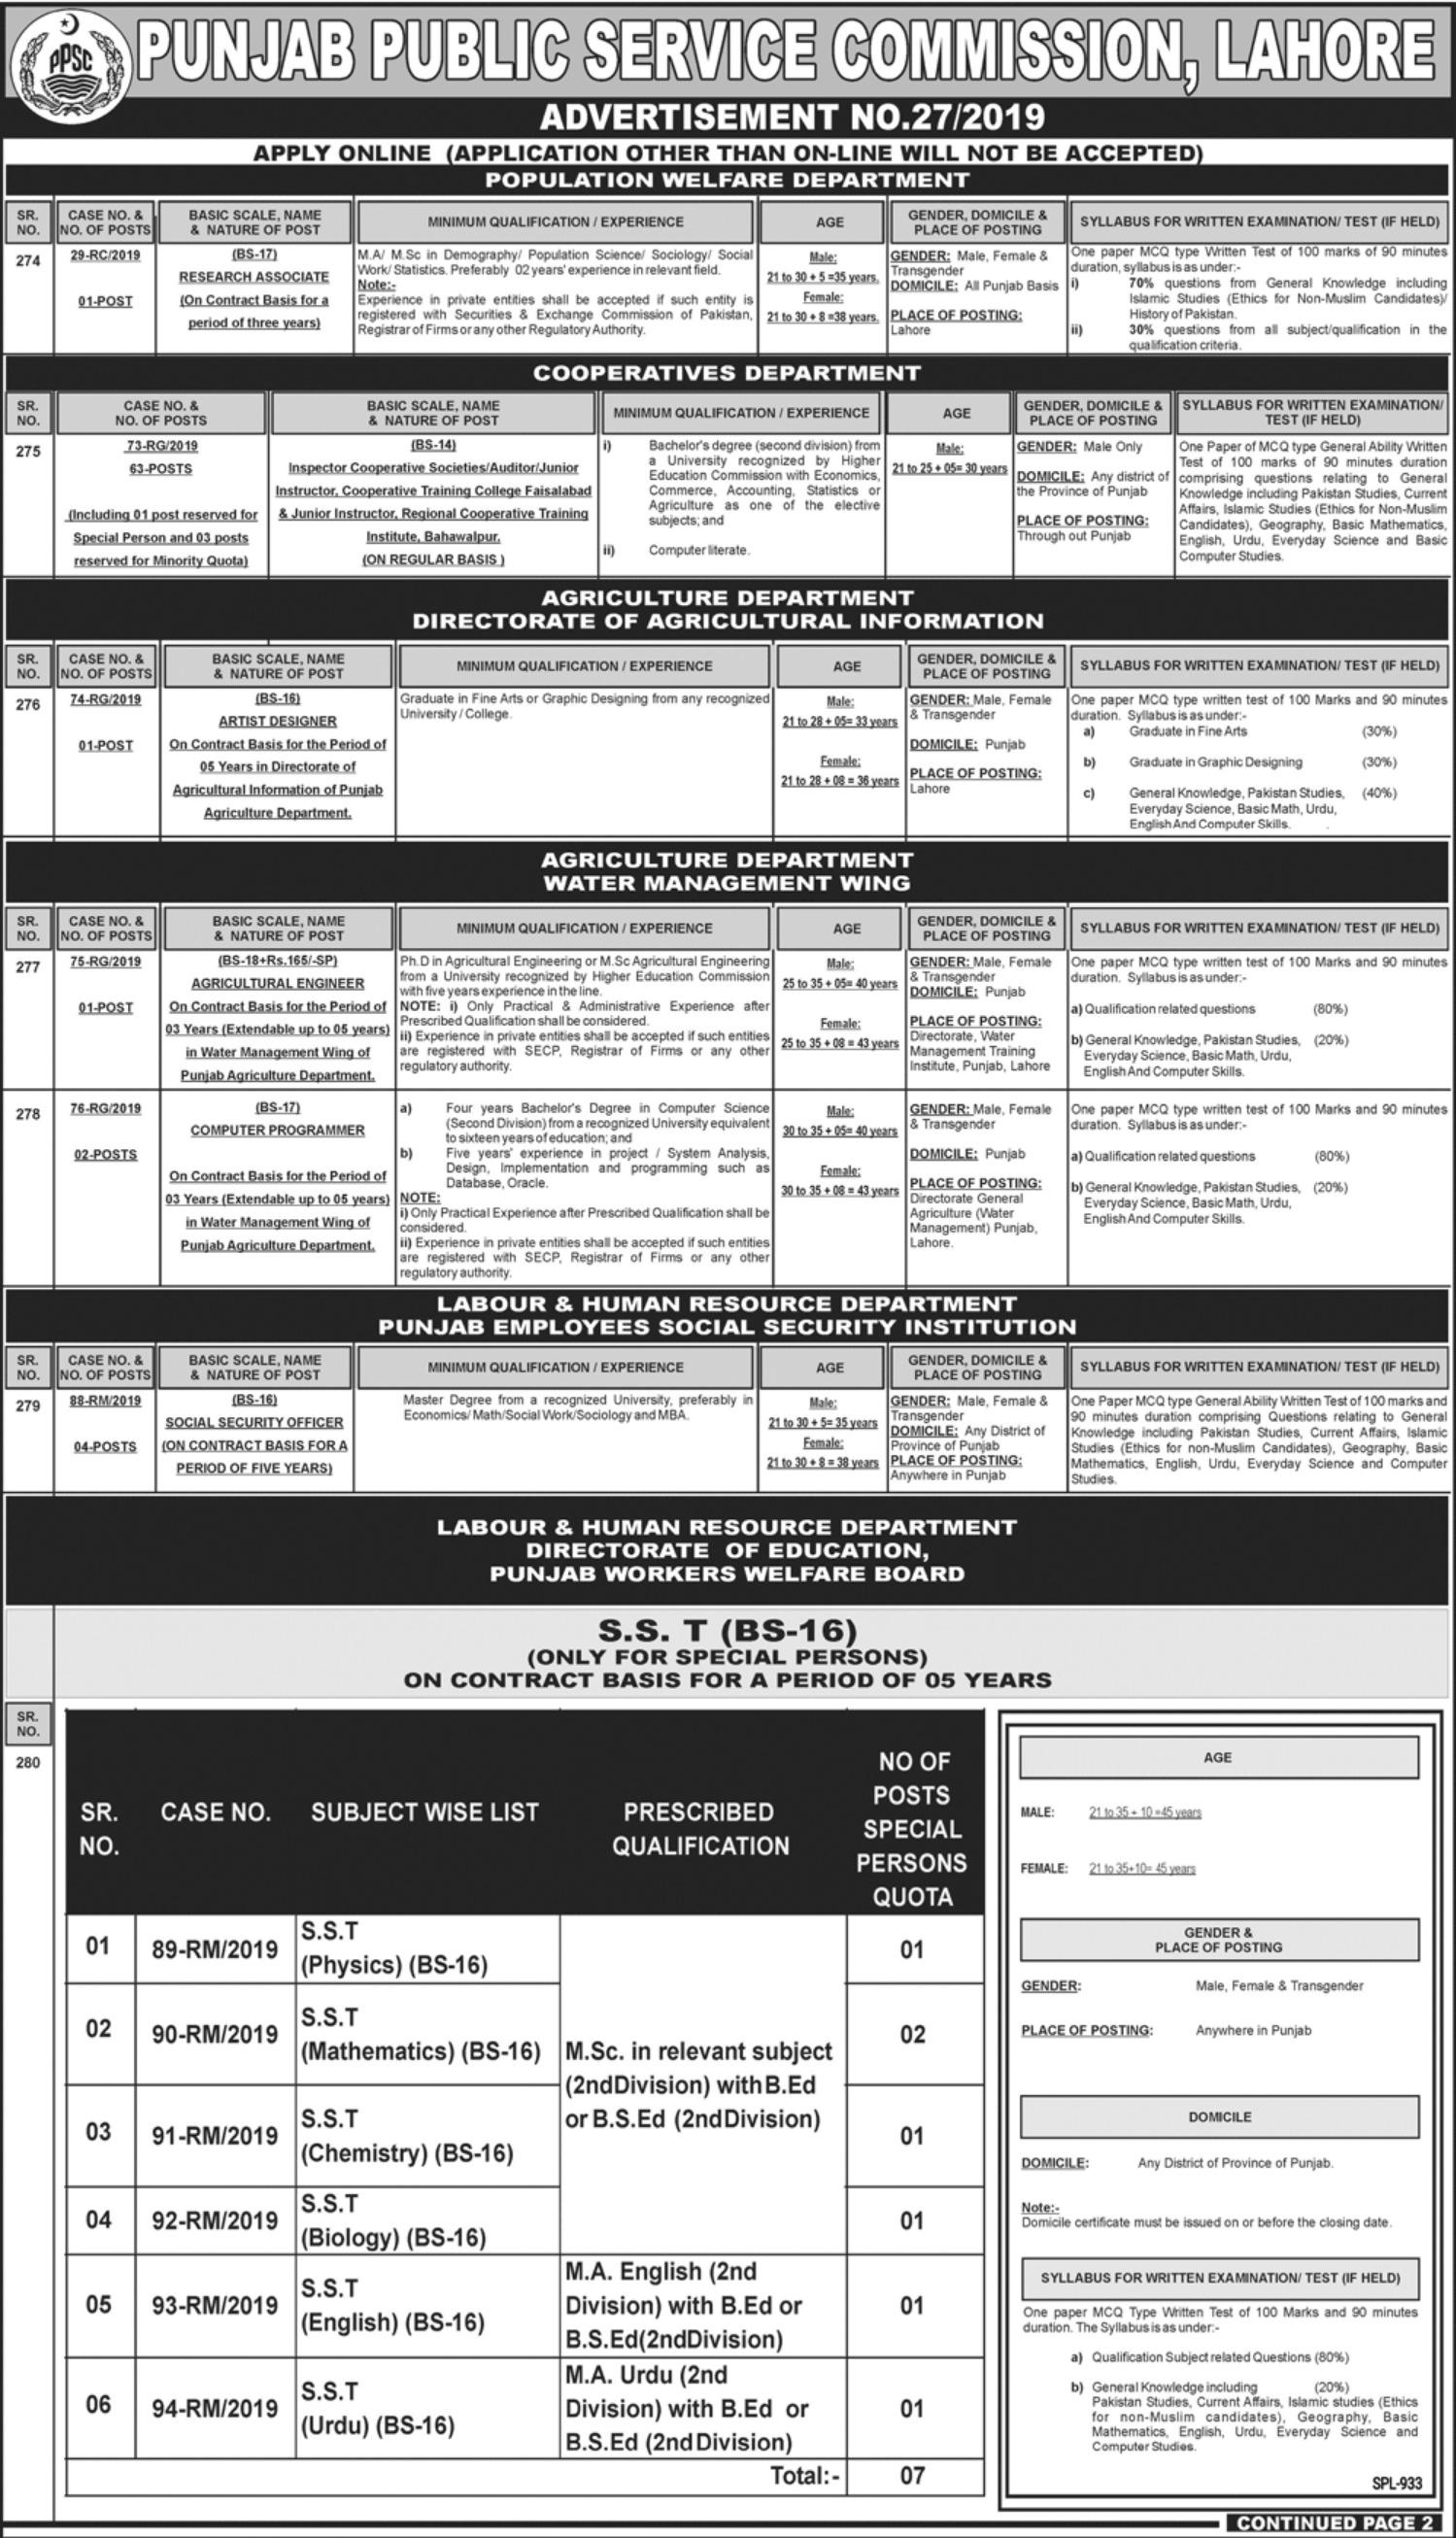 New-PPSC-Jobs-of-Inspector-CS-2019.-Apply-Online.